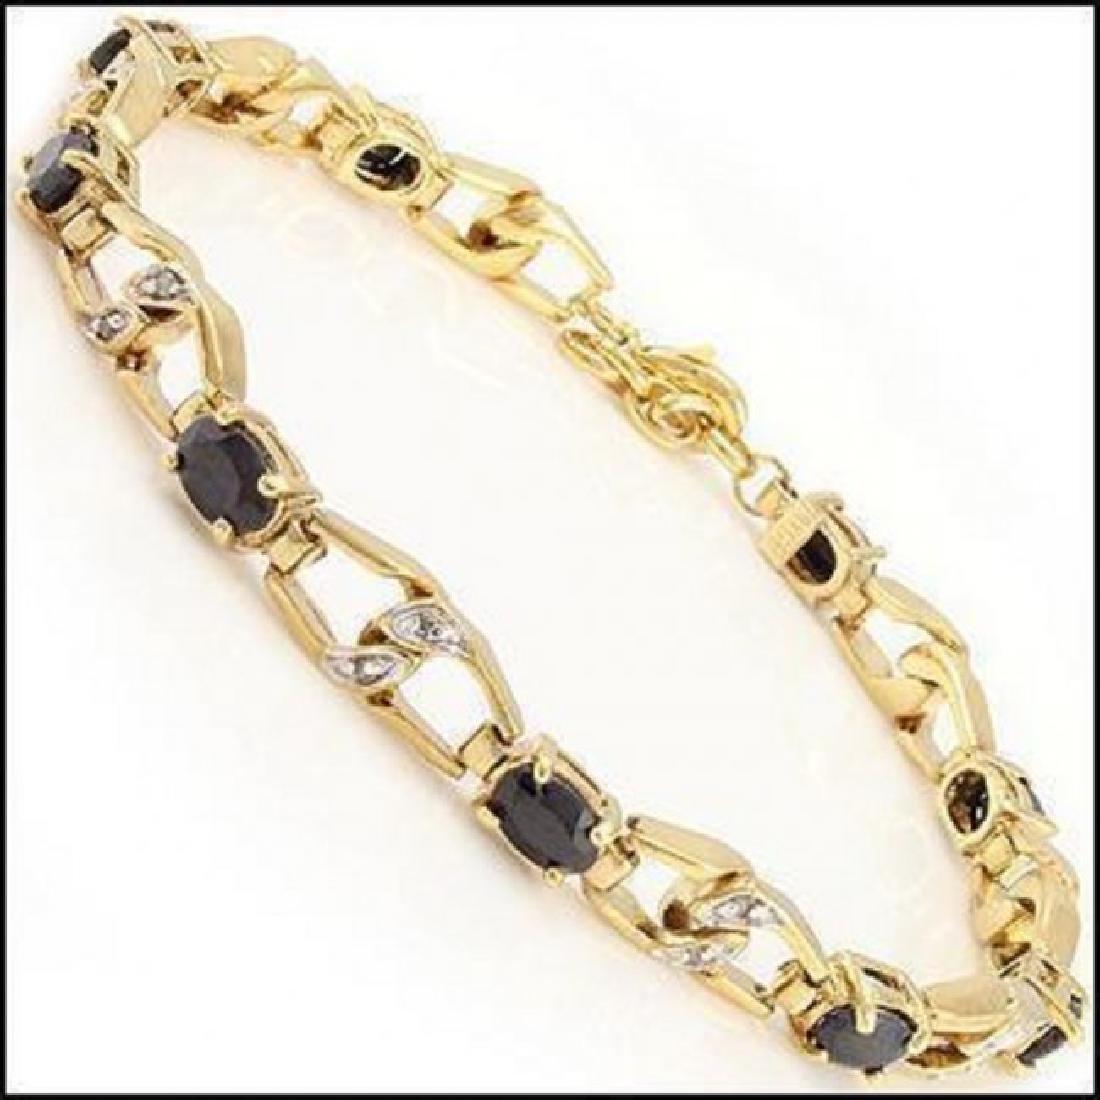 10.21CT Black Sapphire & Diamond Designer Bracelet